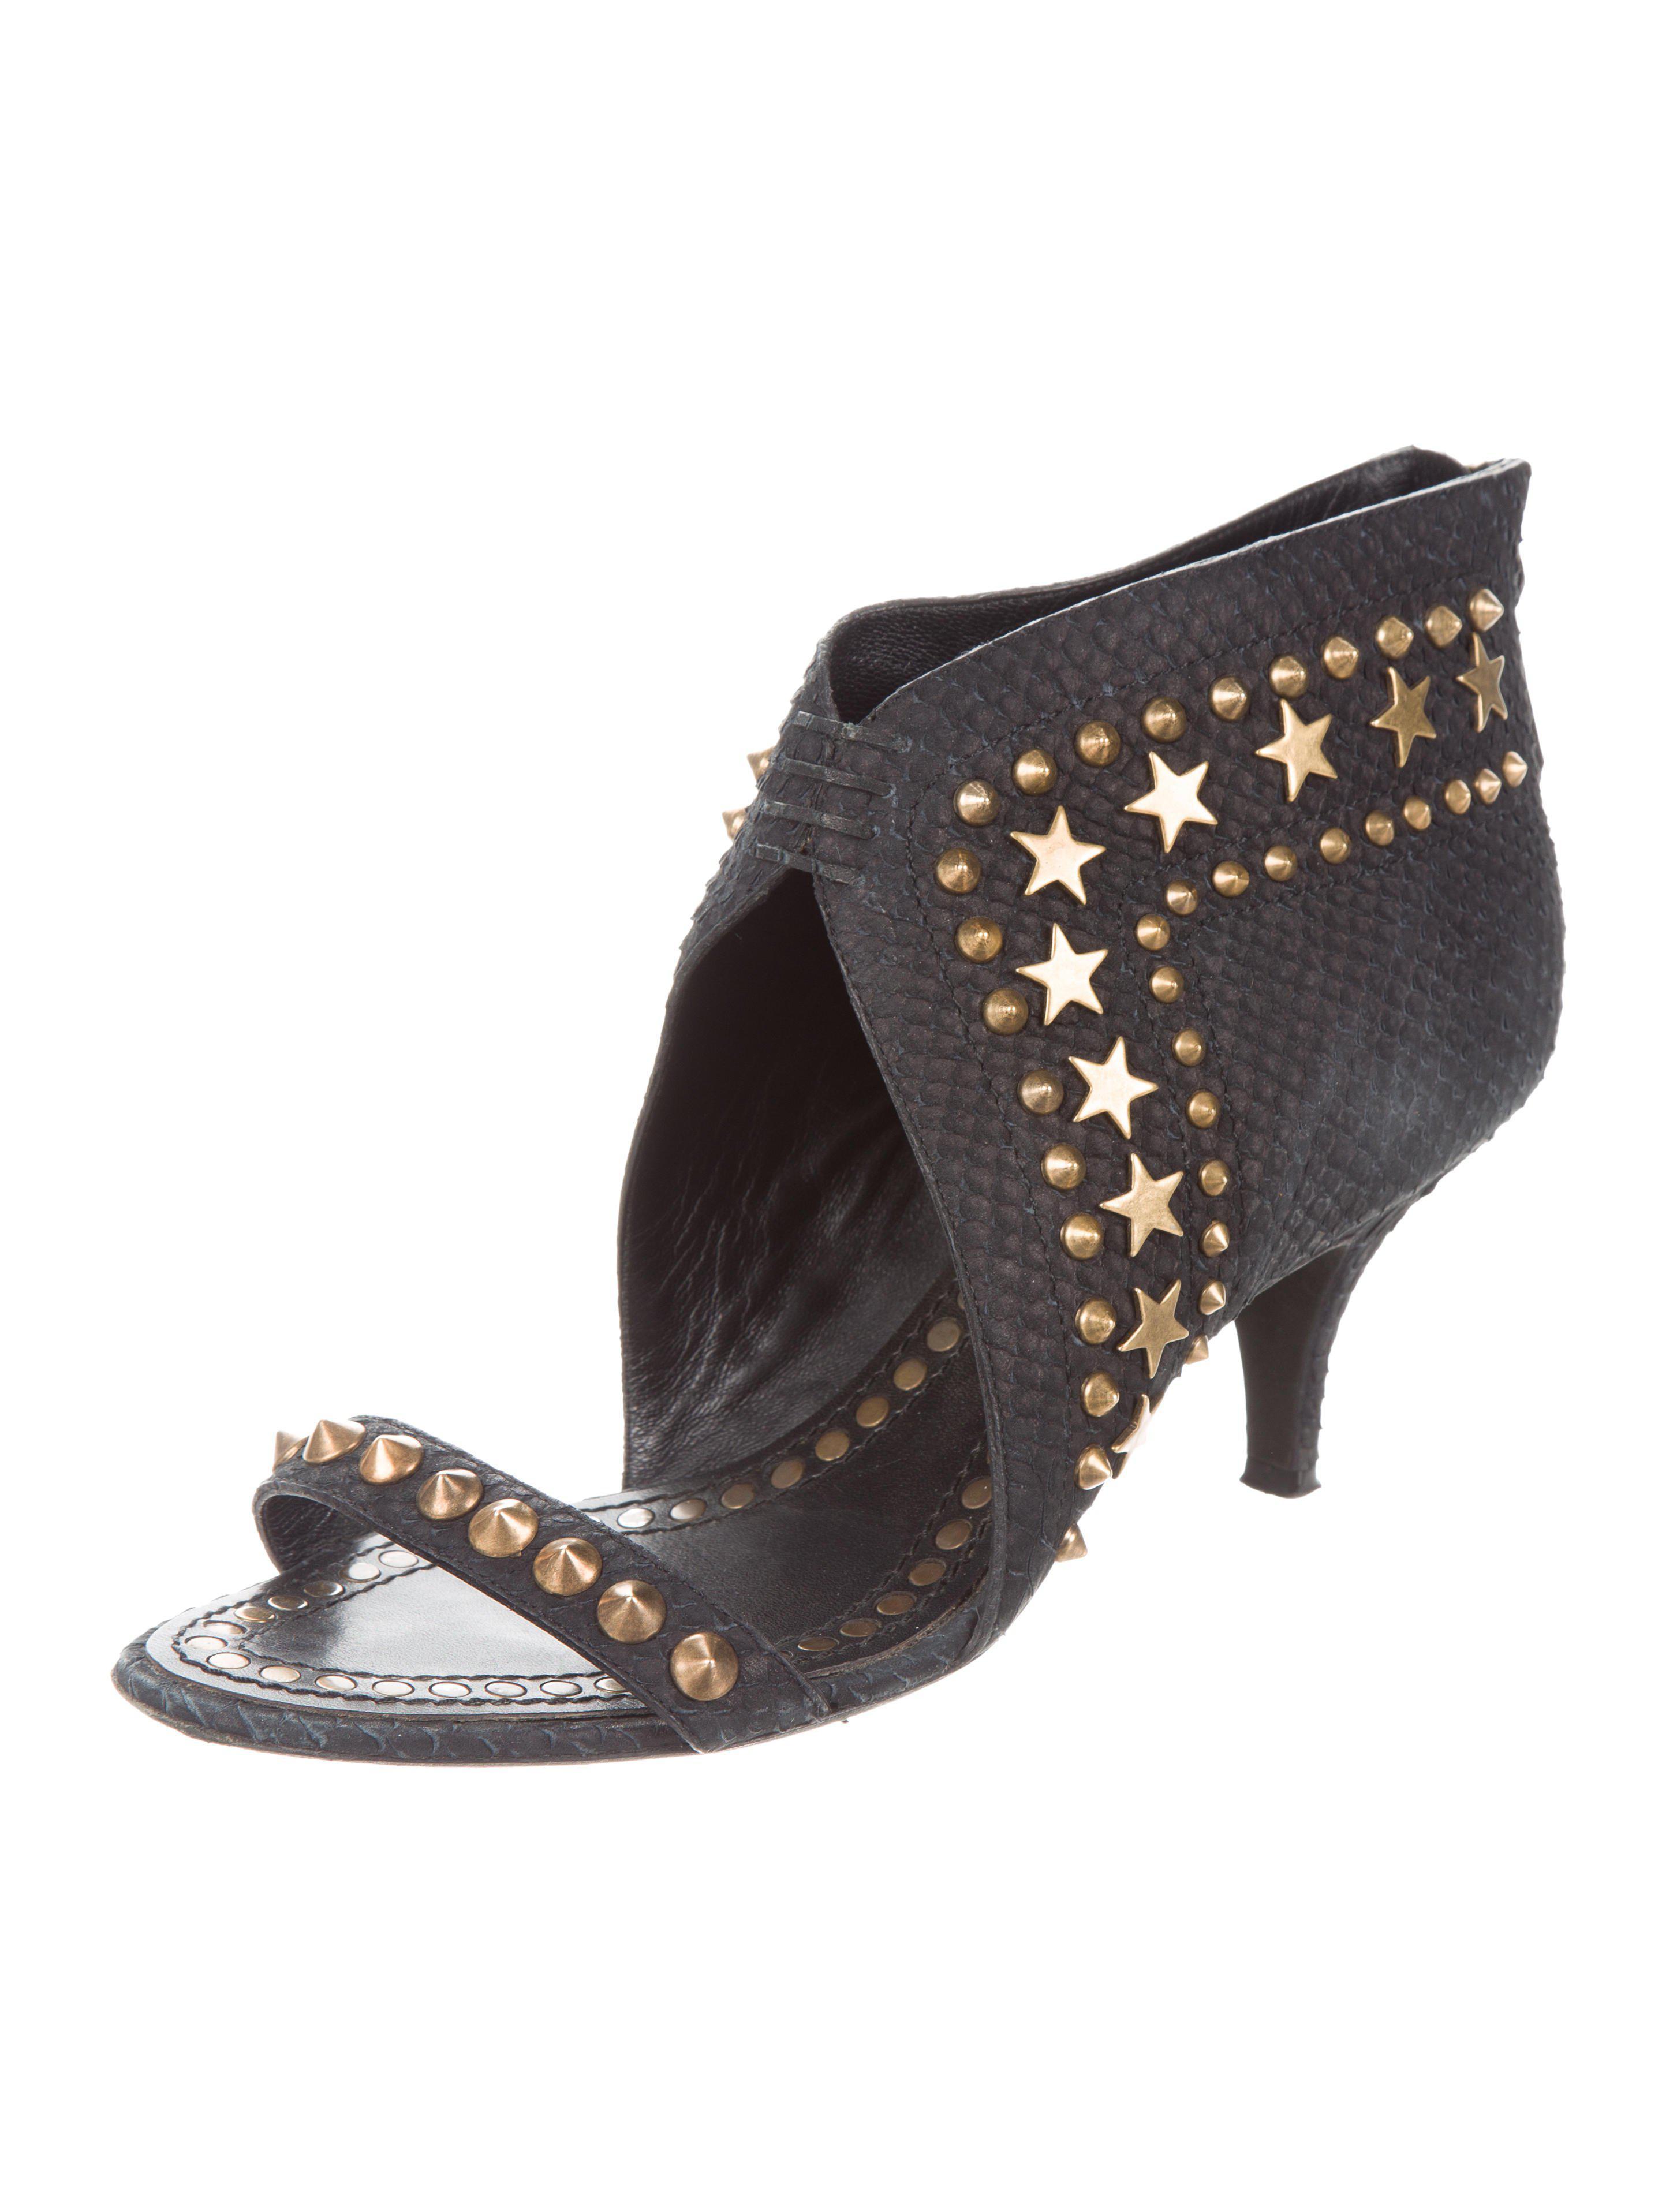 947080b23 Lyst - Givenchy Star Stud Embellished Sandals Black in Metallic